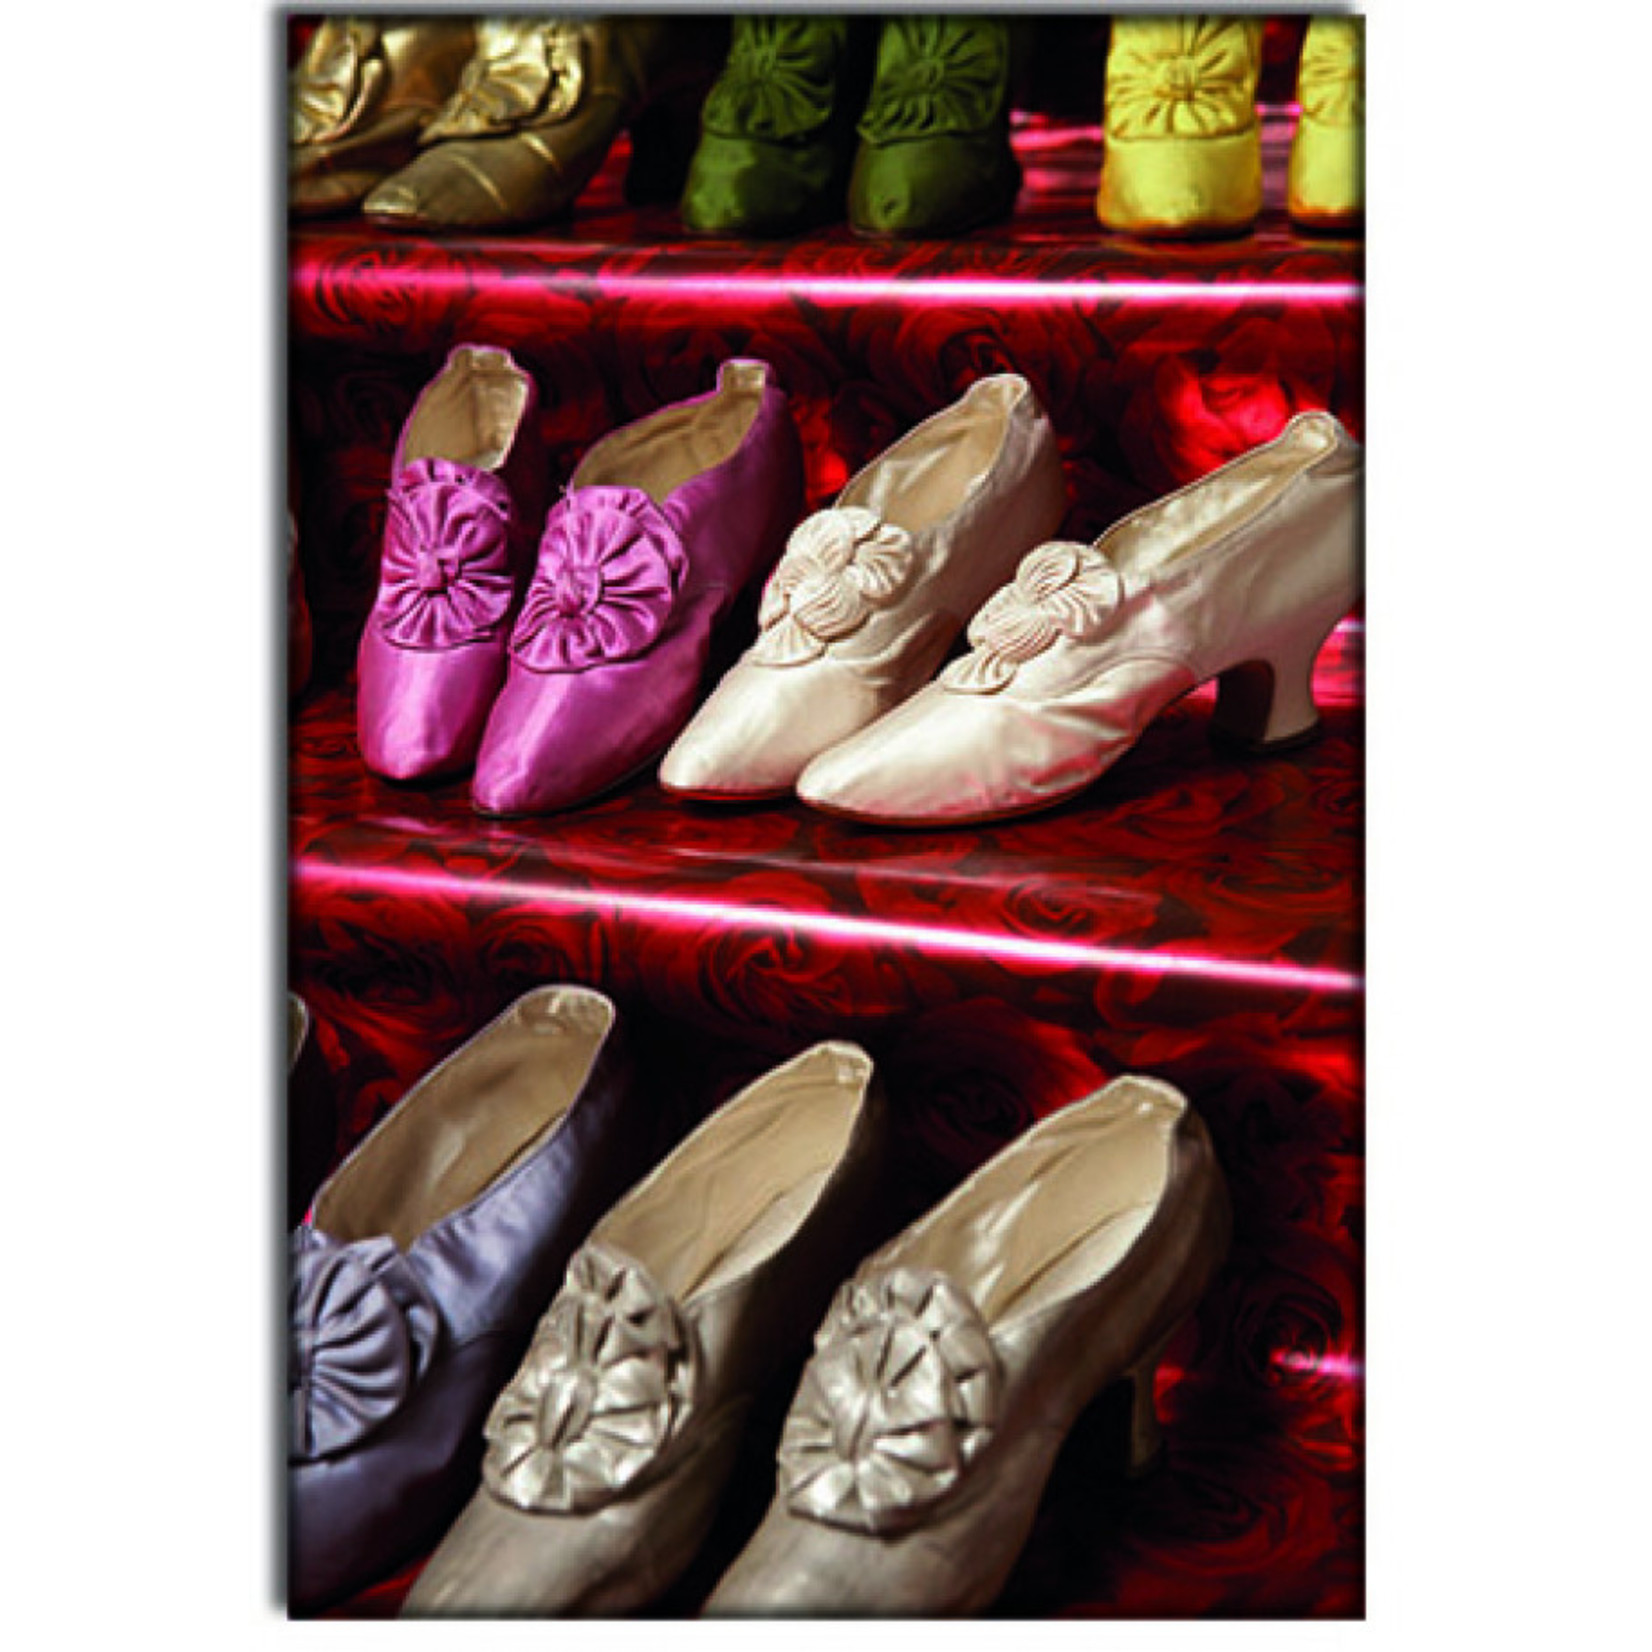 Bekking & Blitz Koelkastmagneet: Shoes, Peter the Great